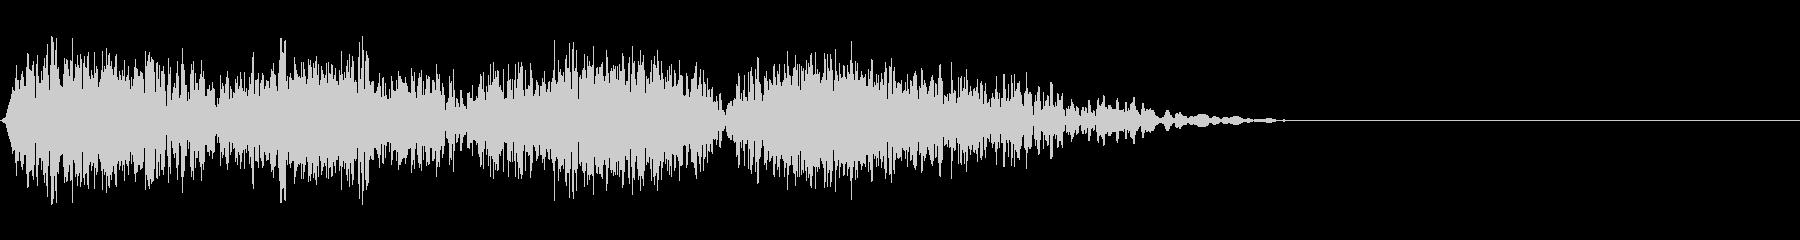 DJスクラッチ08_ワンショット03の未再生の波形